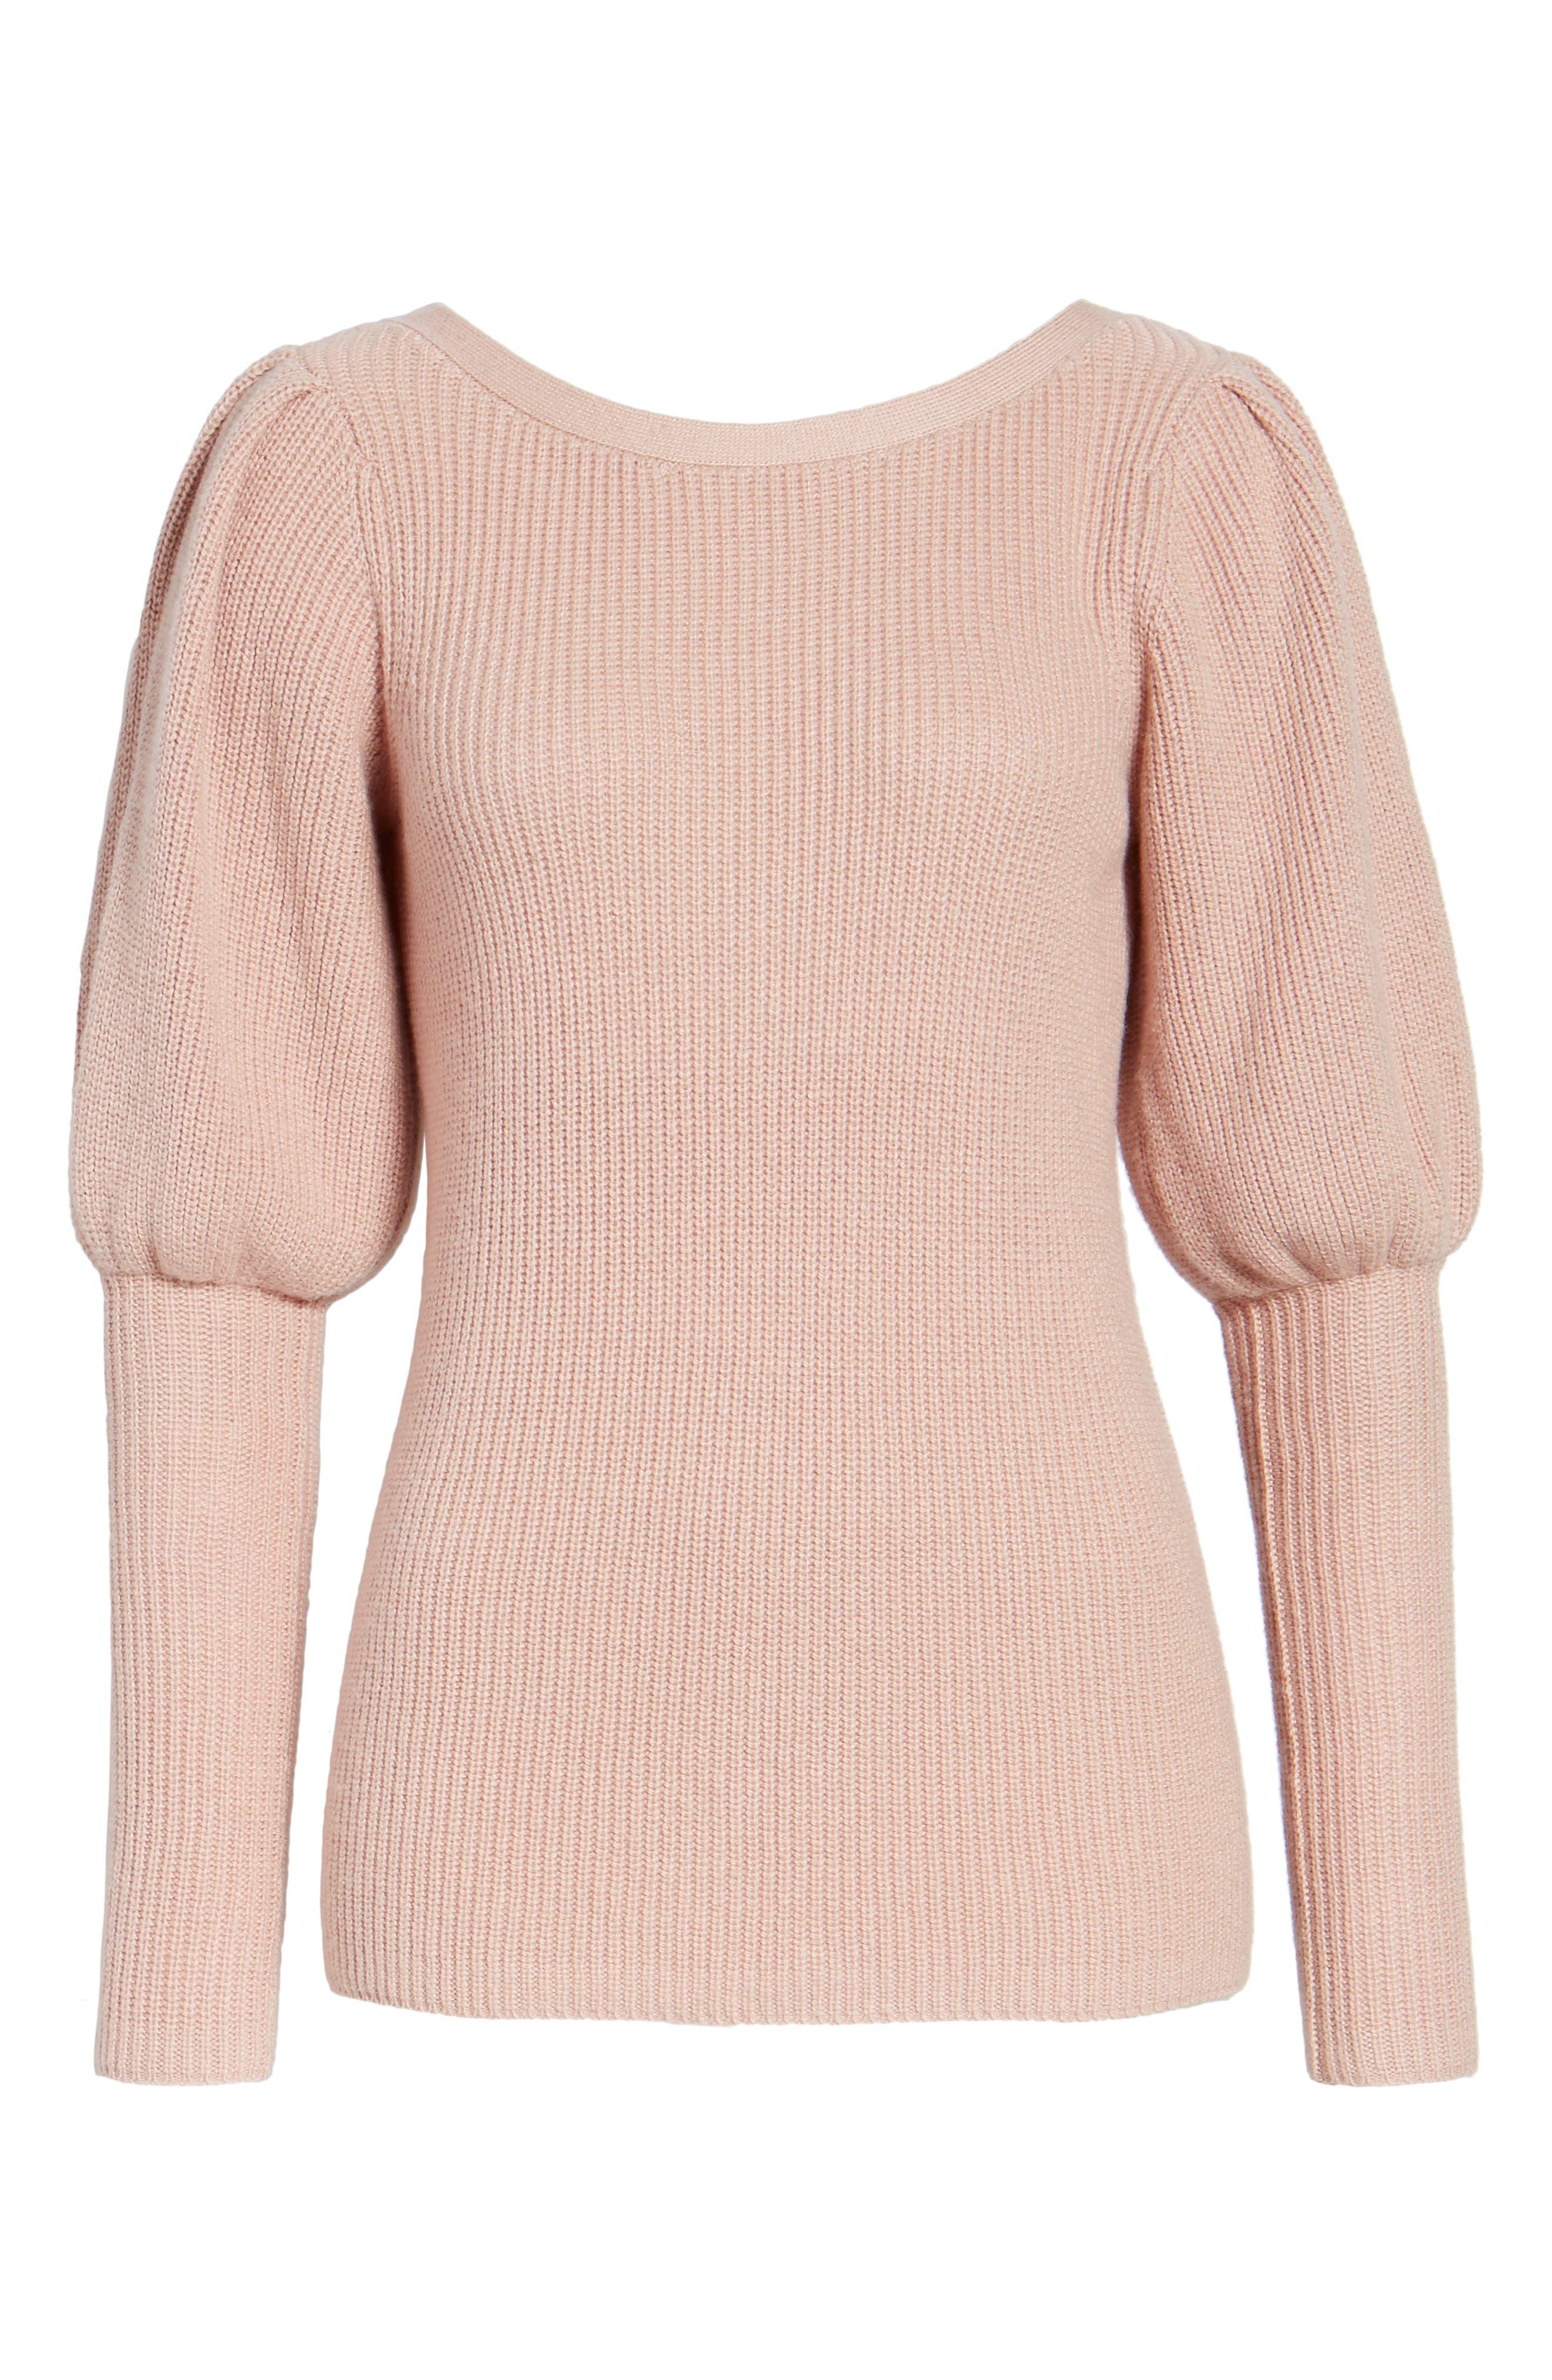 Puff Sleeve Sweatser,                             Alternate thumbnail 6, color,                             Pink Adobe